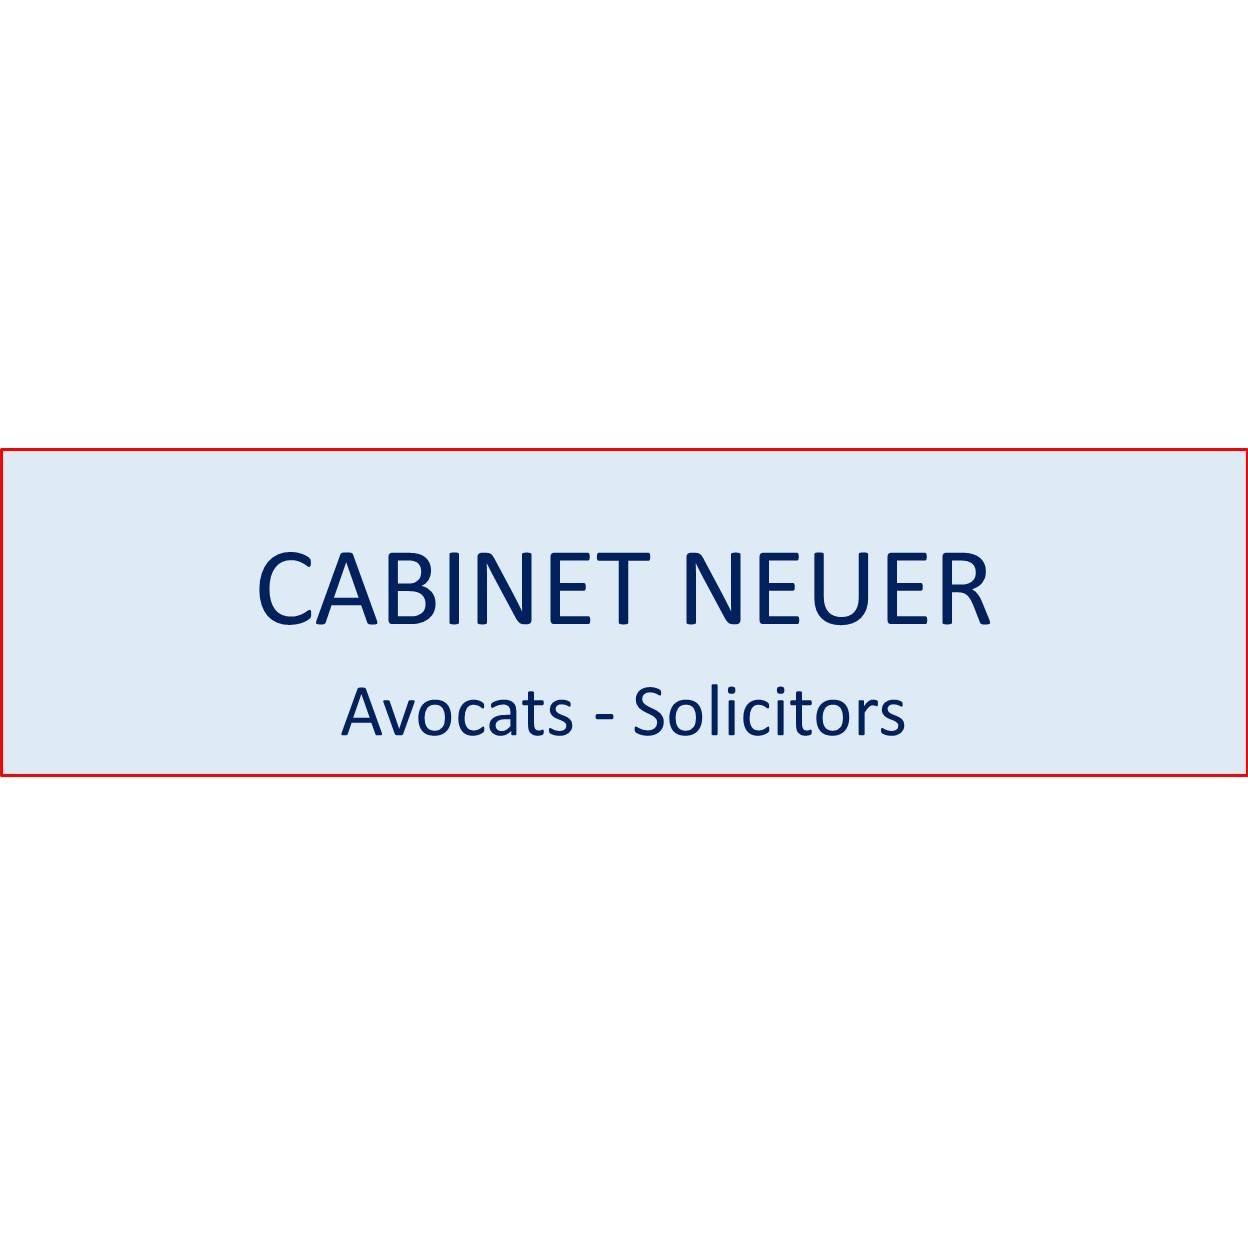 the Cabinet Neuer logo.